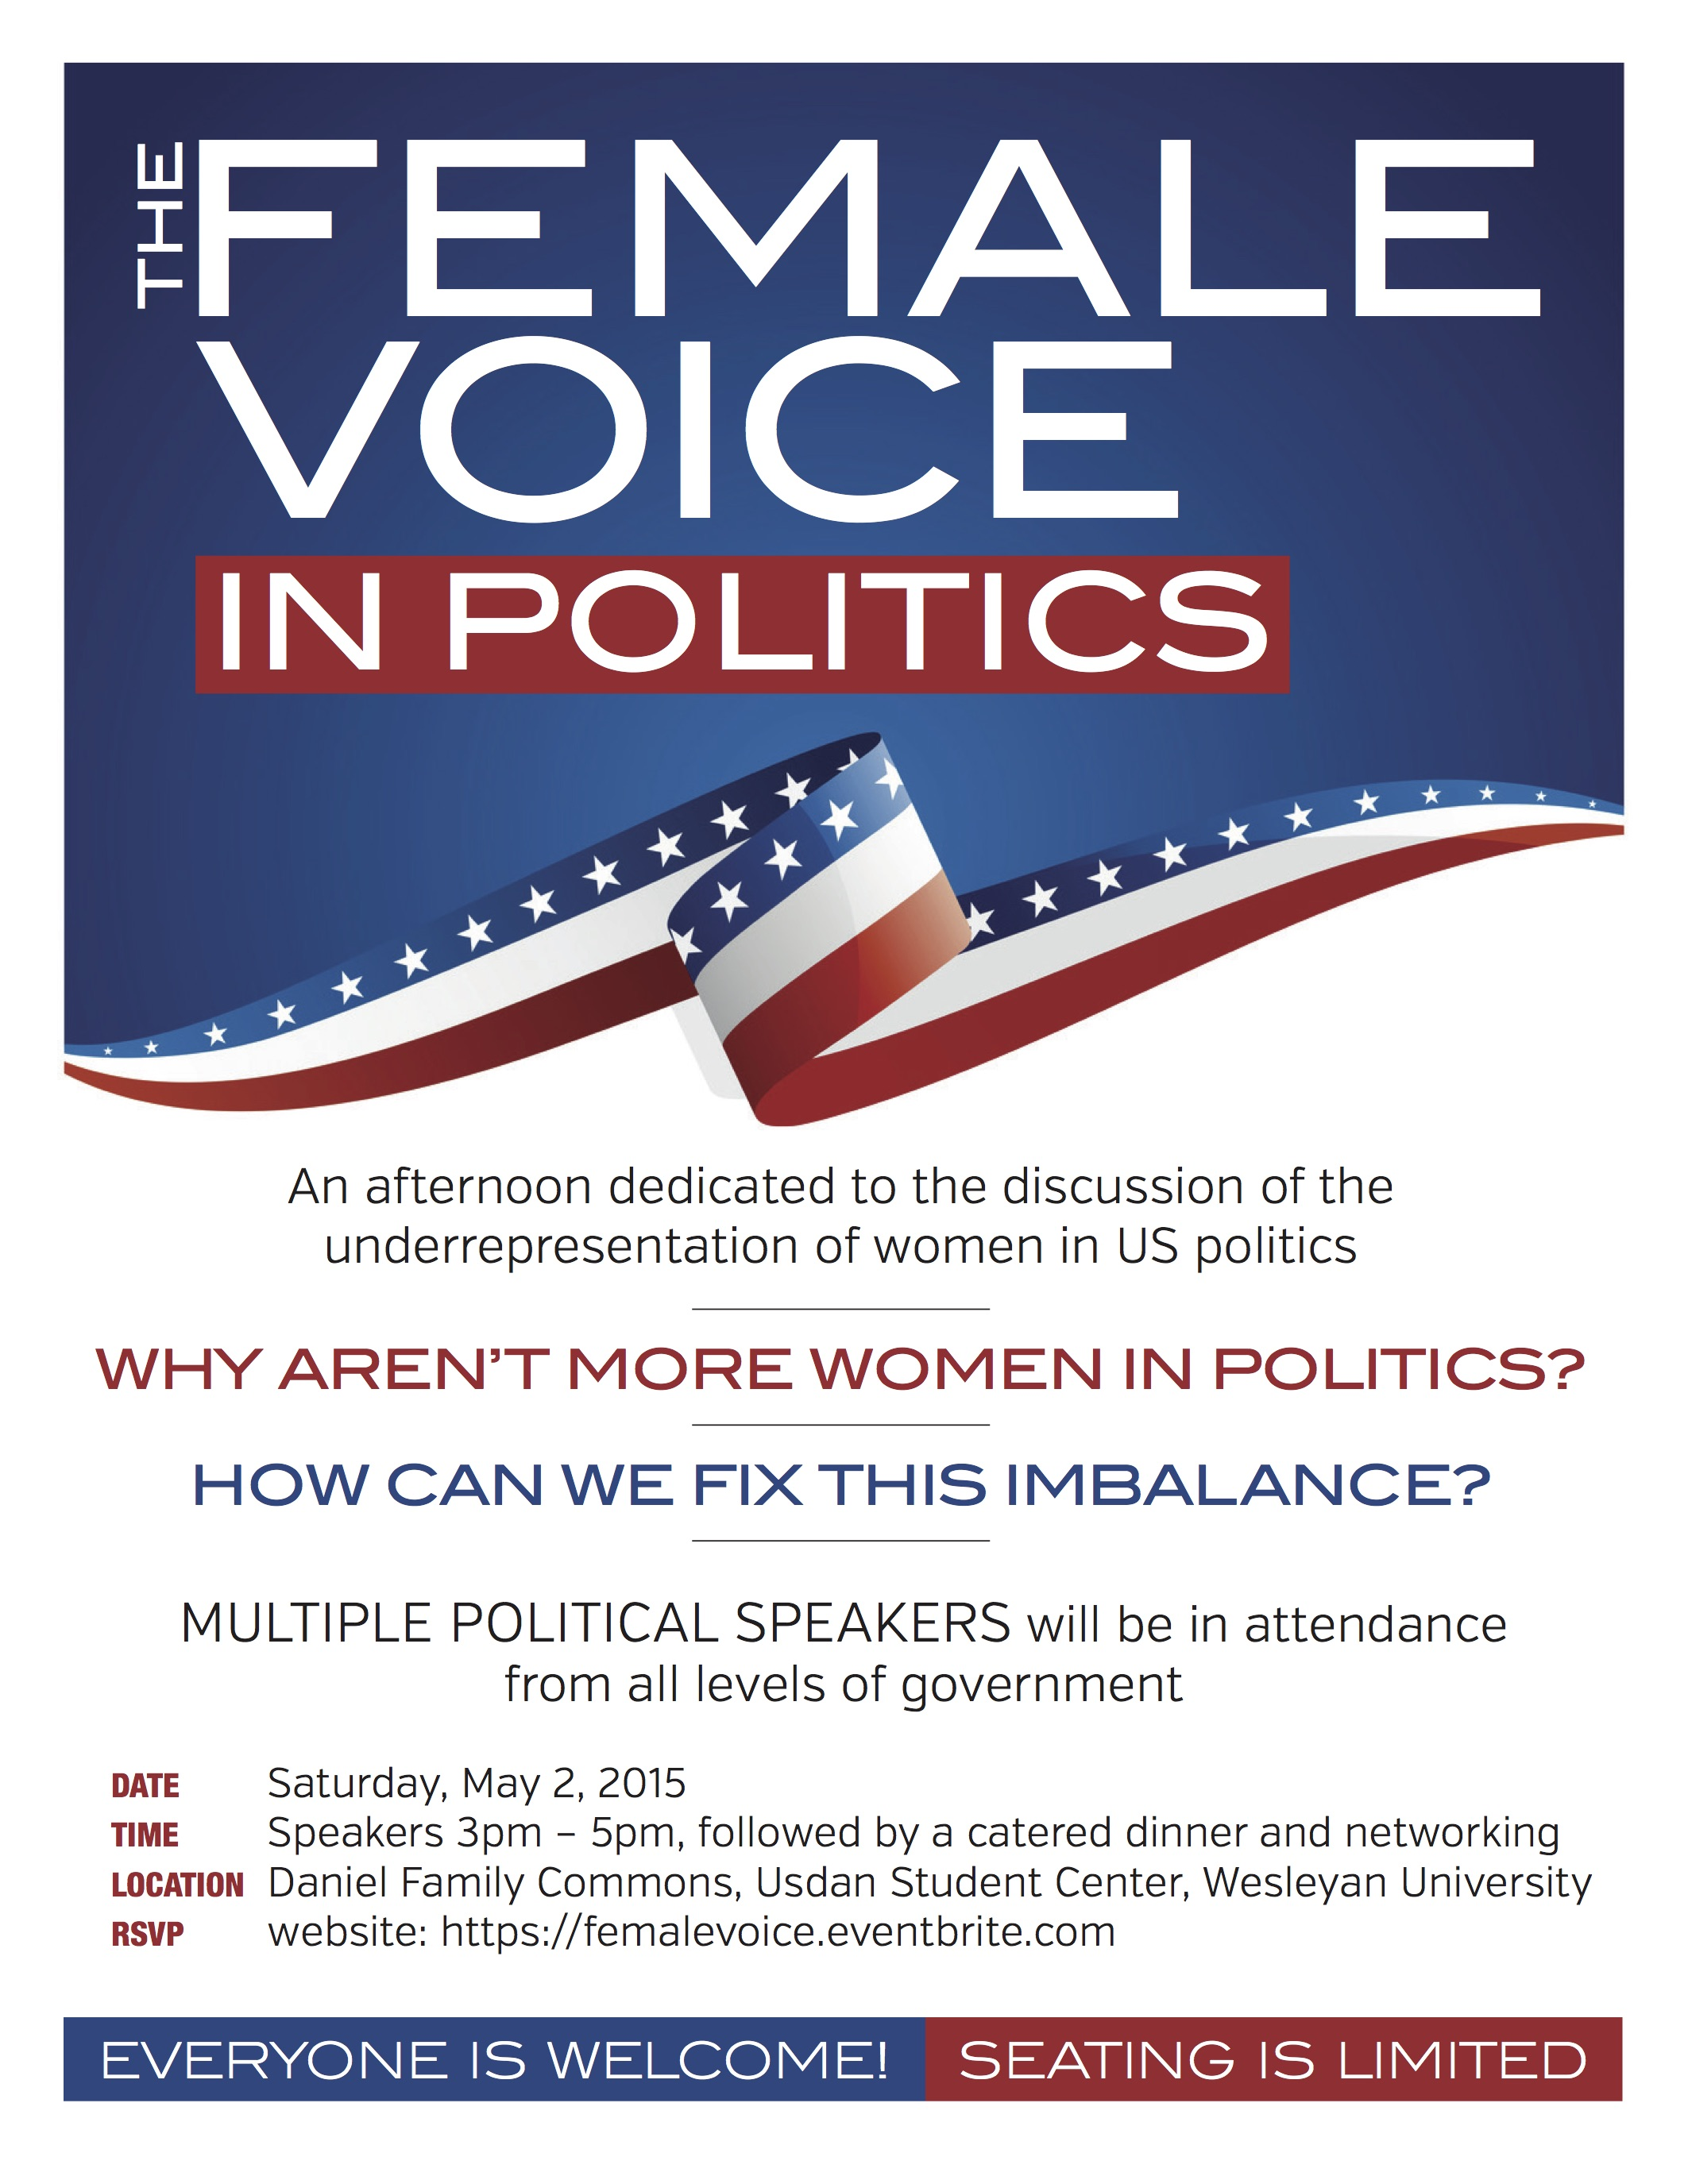 Female Voice in Politics Flyer